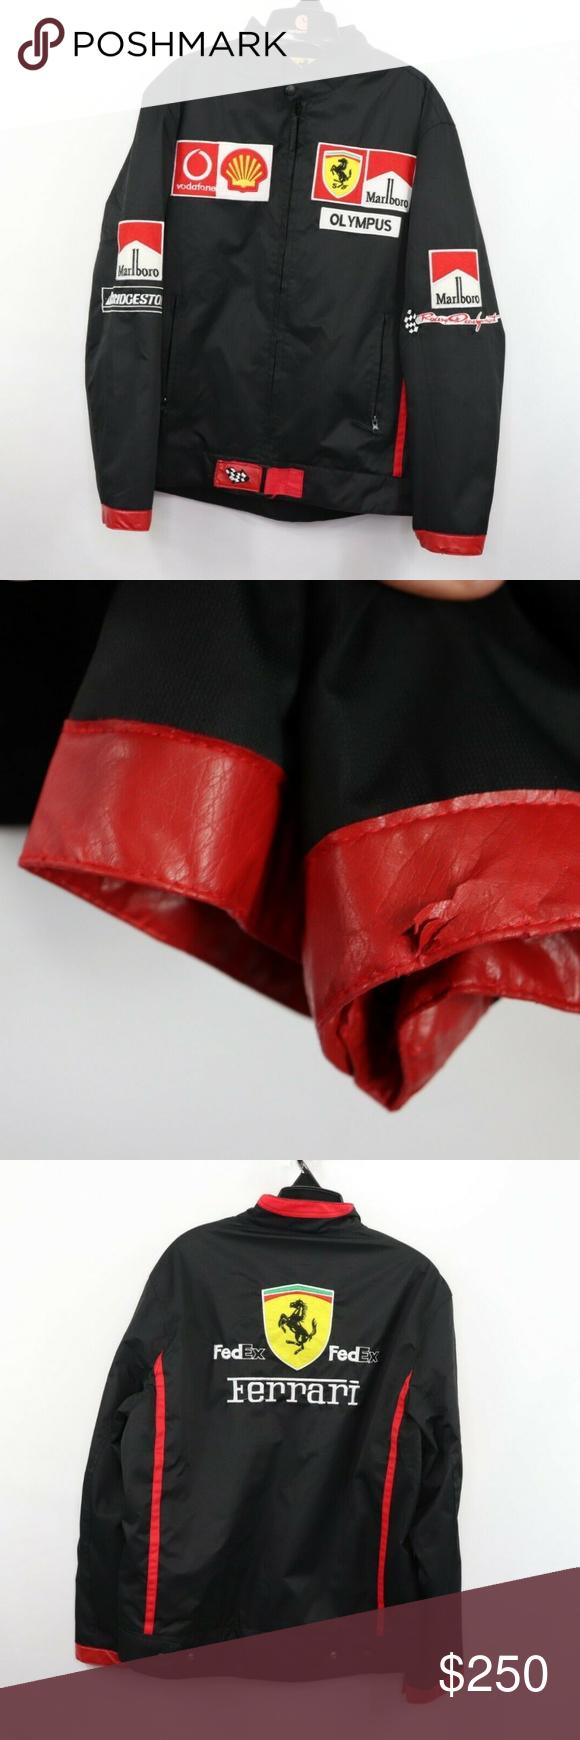 Vintage Ferrari Racing Marlboro Spell Out Jacket Jackets Clothes Design Ferrari